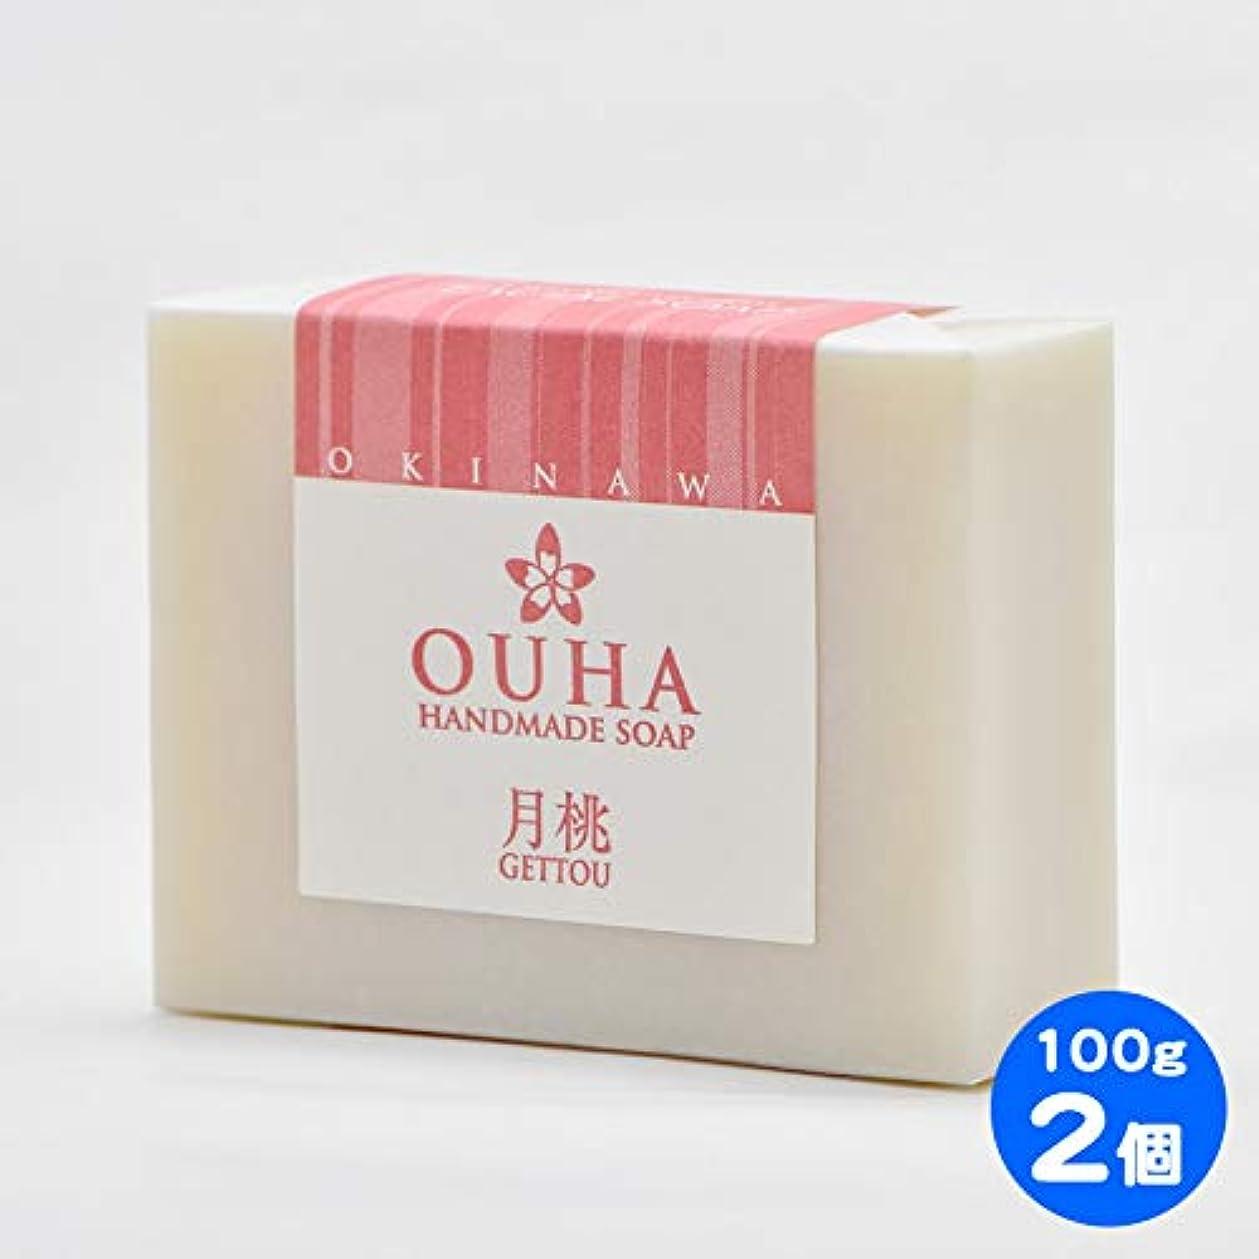 心配製造生産性【送料無料 定形外郵便】沖縄県産 OUHAソープ 月桃 石鹸 100g 2個セット